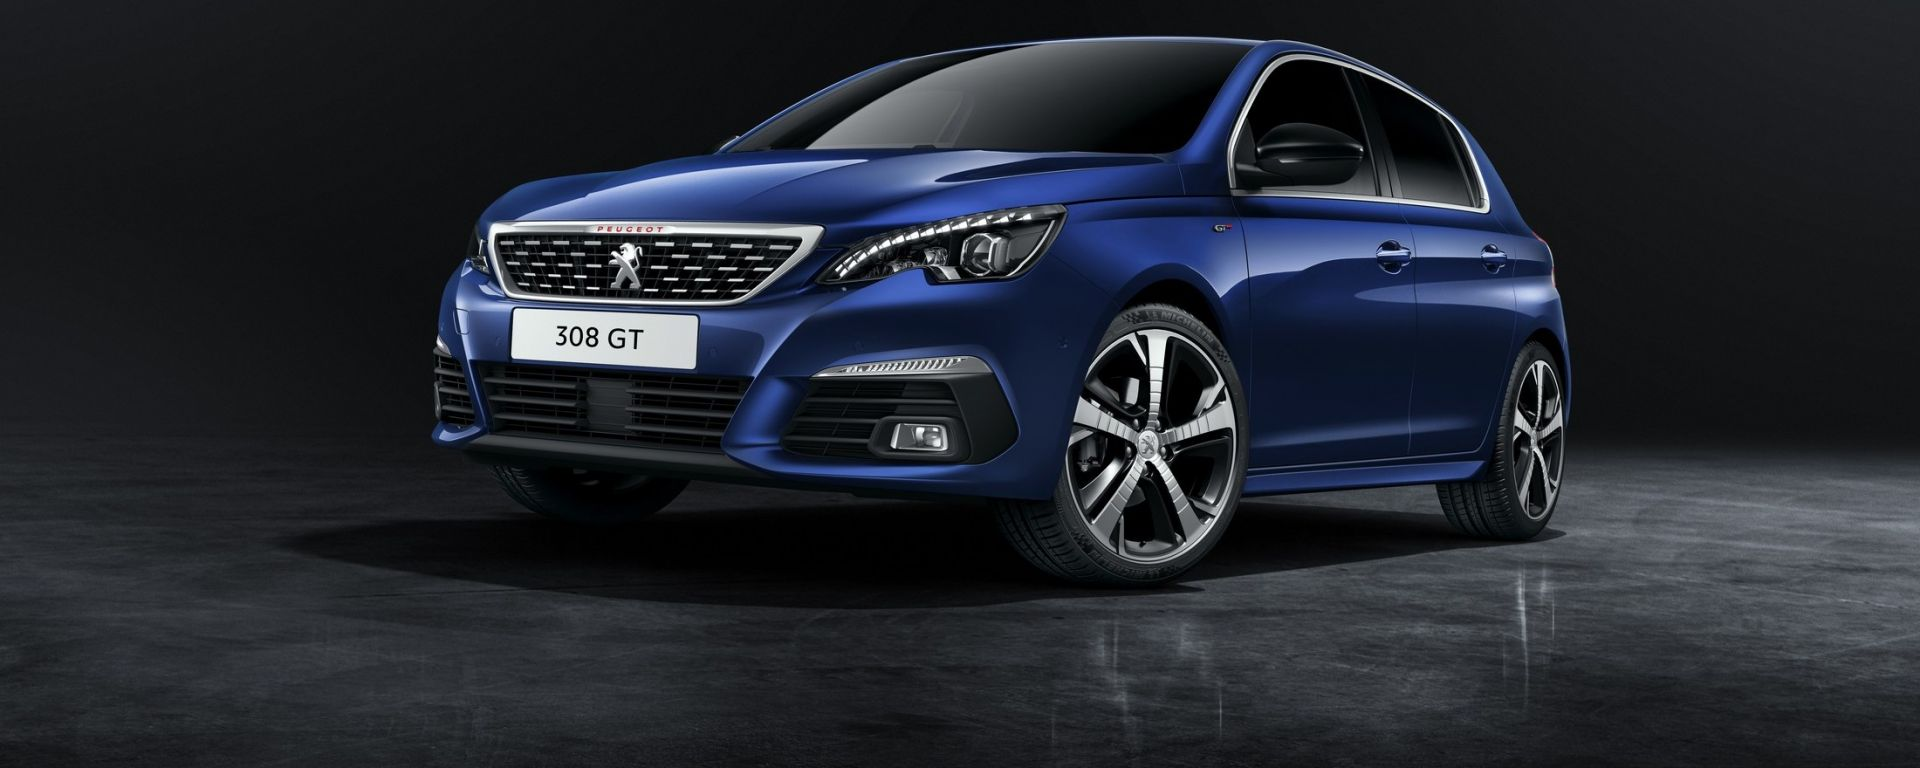 Nuova Peugeot 308: vista 3/4 anteriore